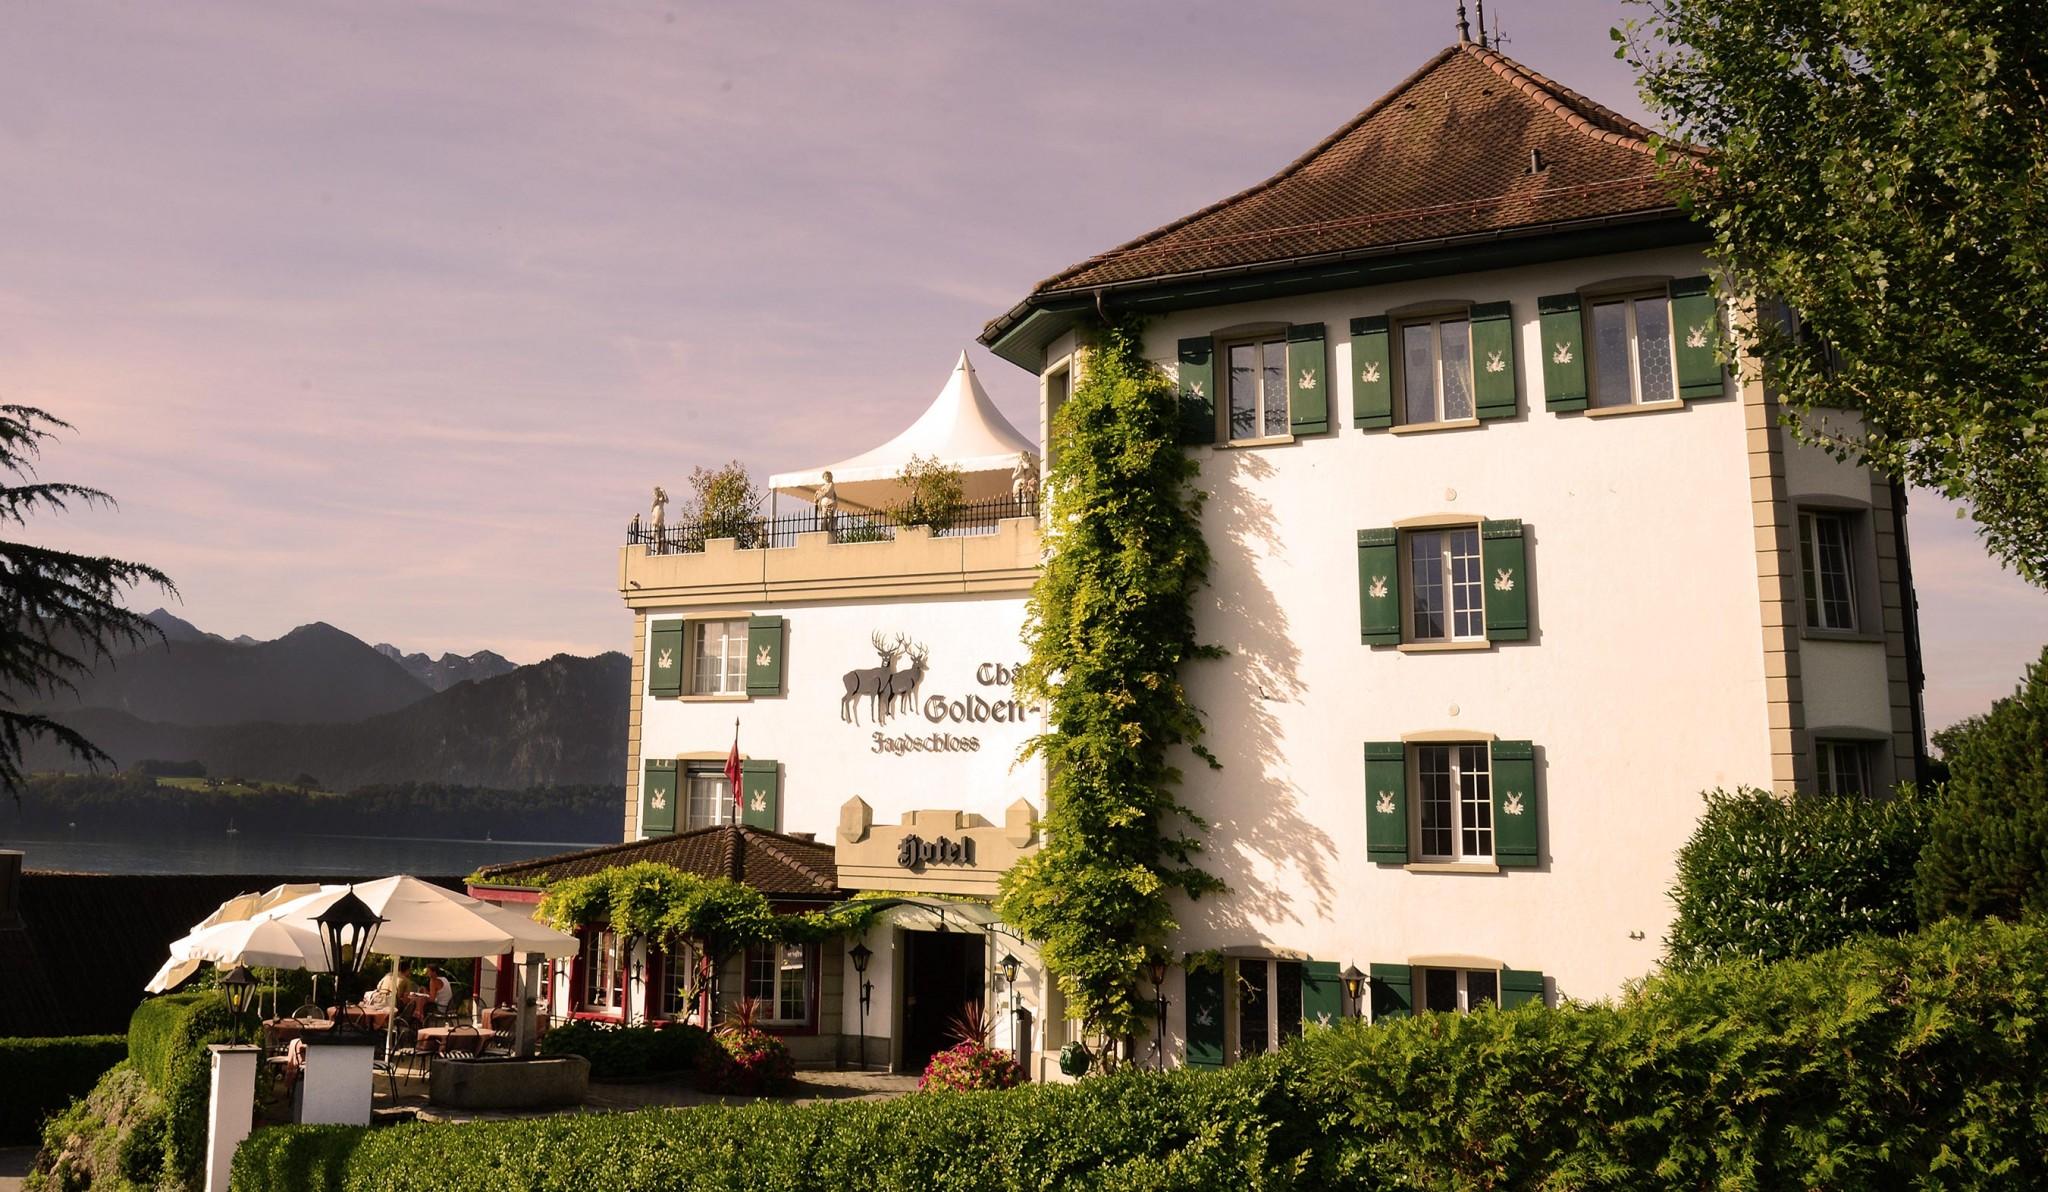 SWISS-CHALET-Jagdhotel-main